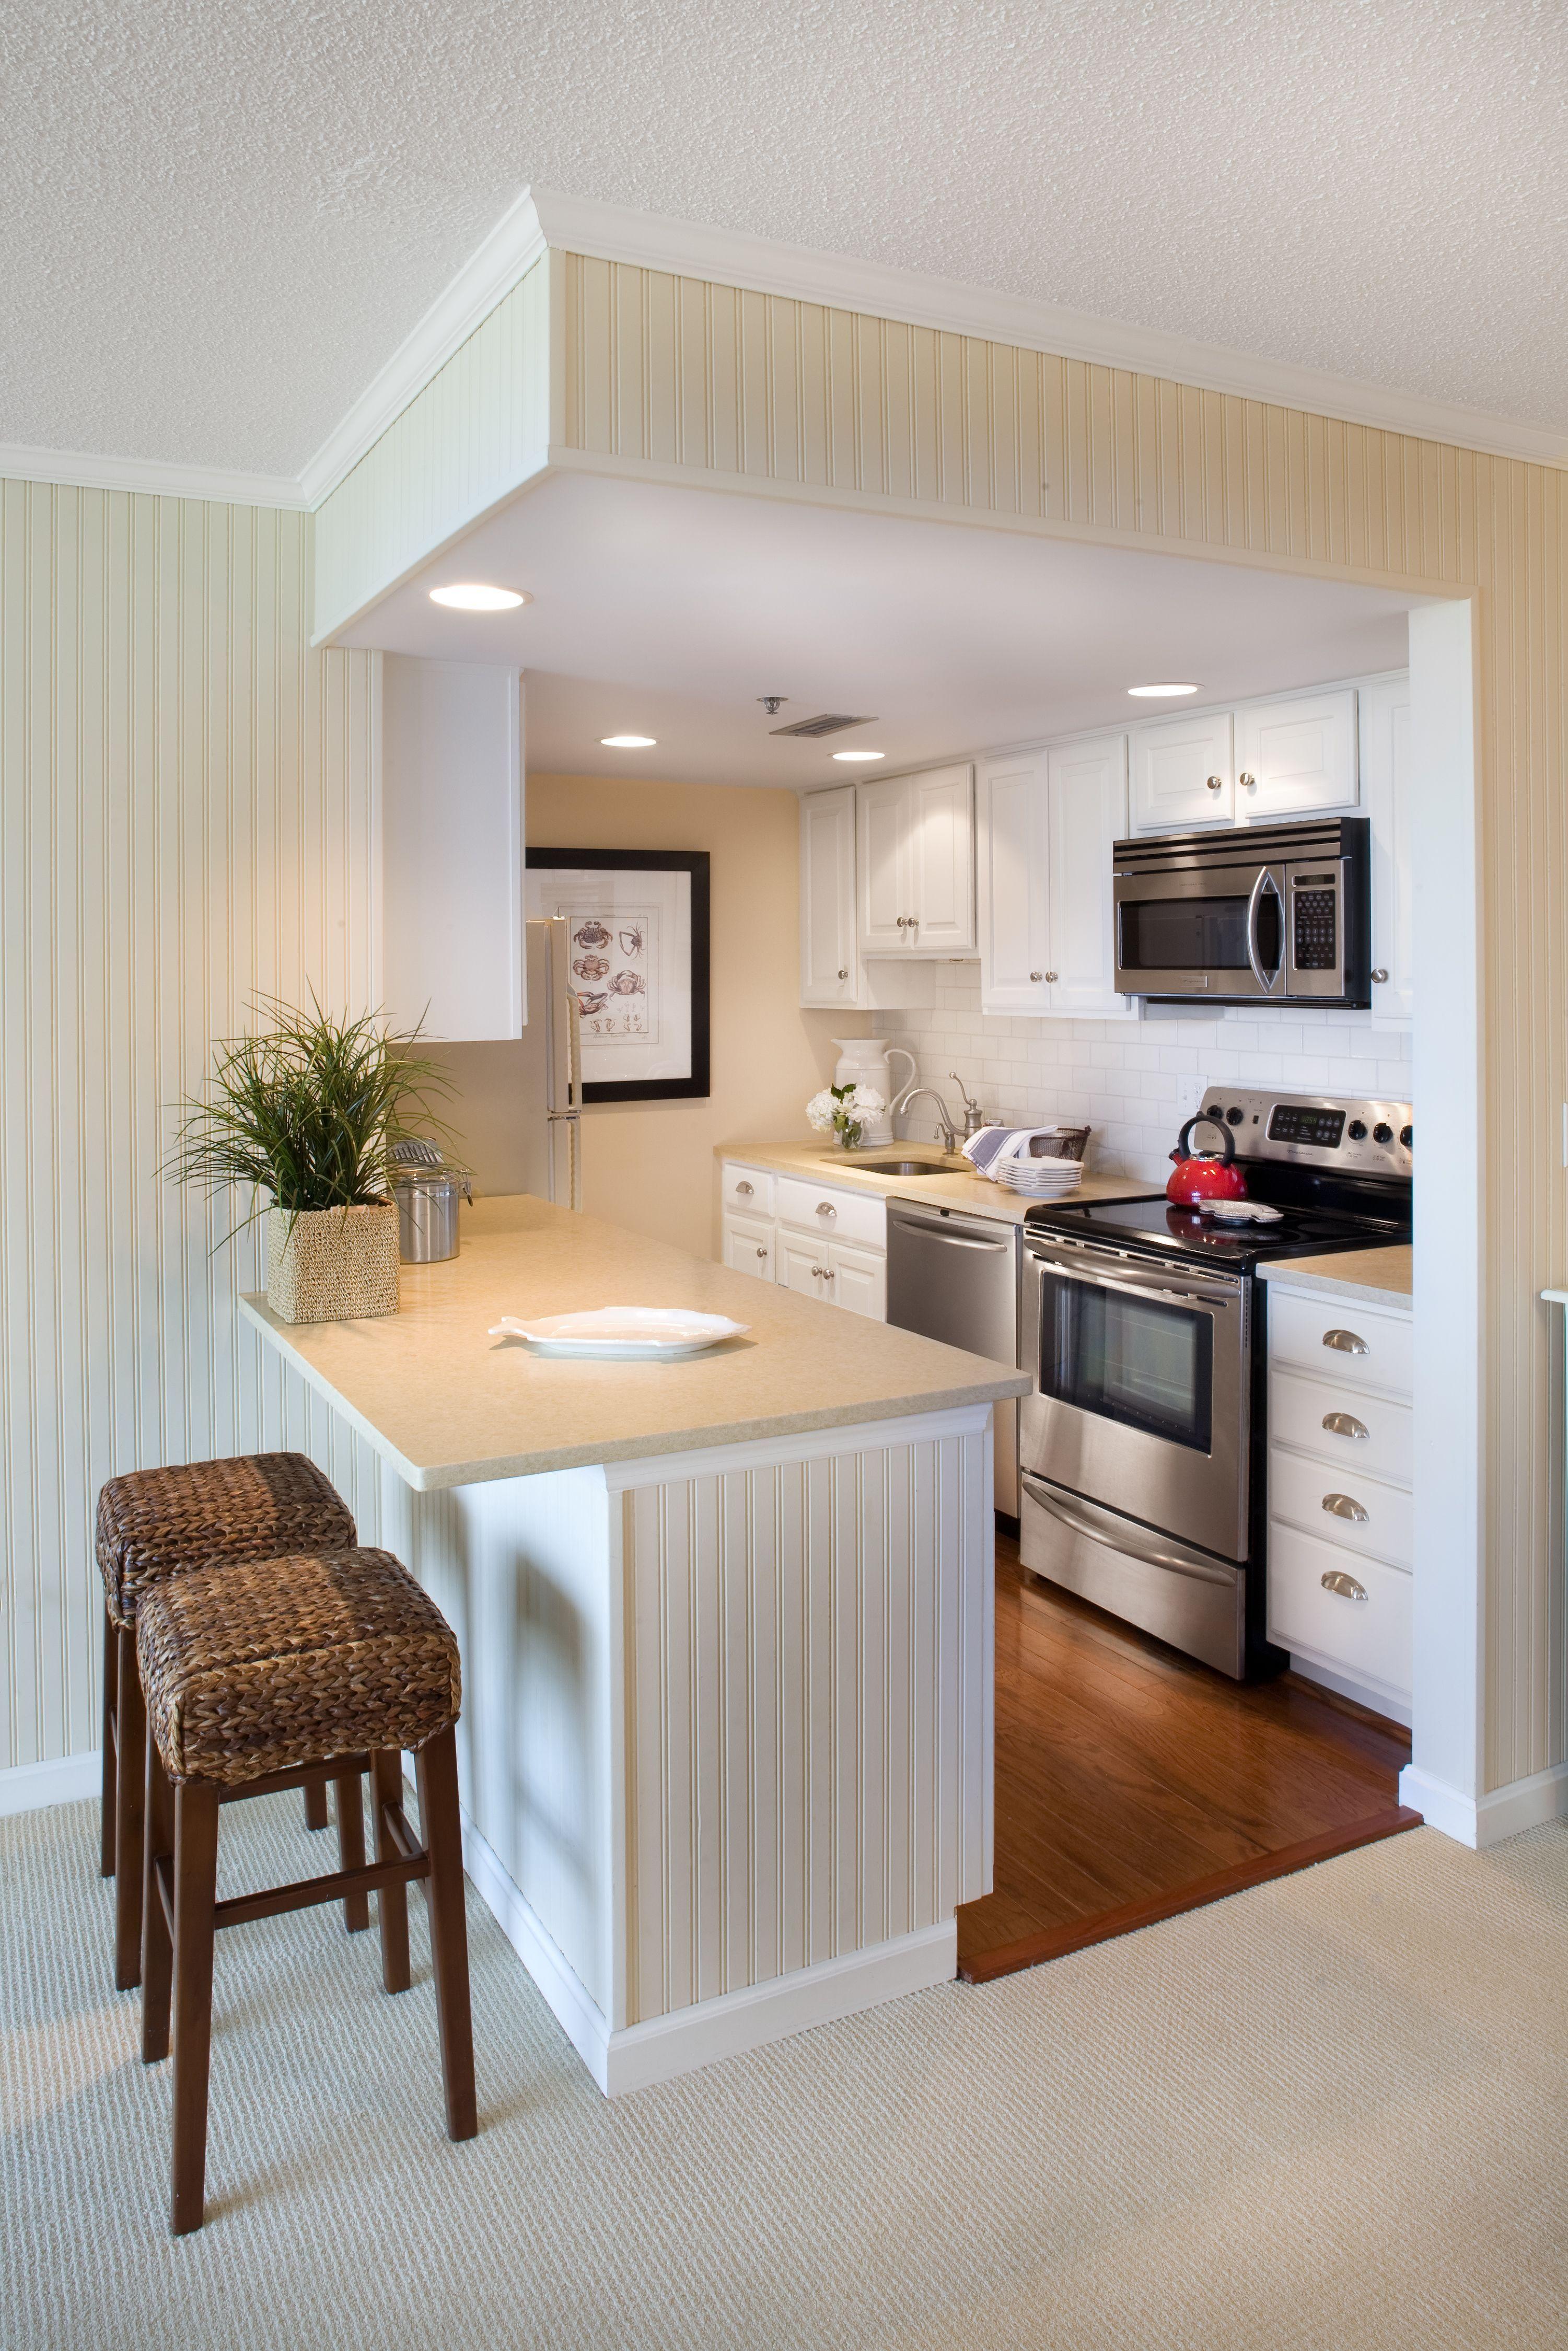 Small Apartment Ideas Kitchen 12 Popular Kitchen Layout Design Ideas Kitchen Pint Small Apartment Kitchen Kitchen Decor Apartment Small Apartment Kitchen Decor